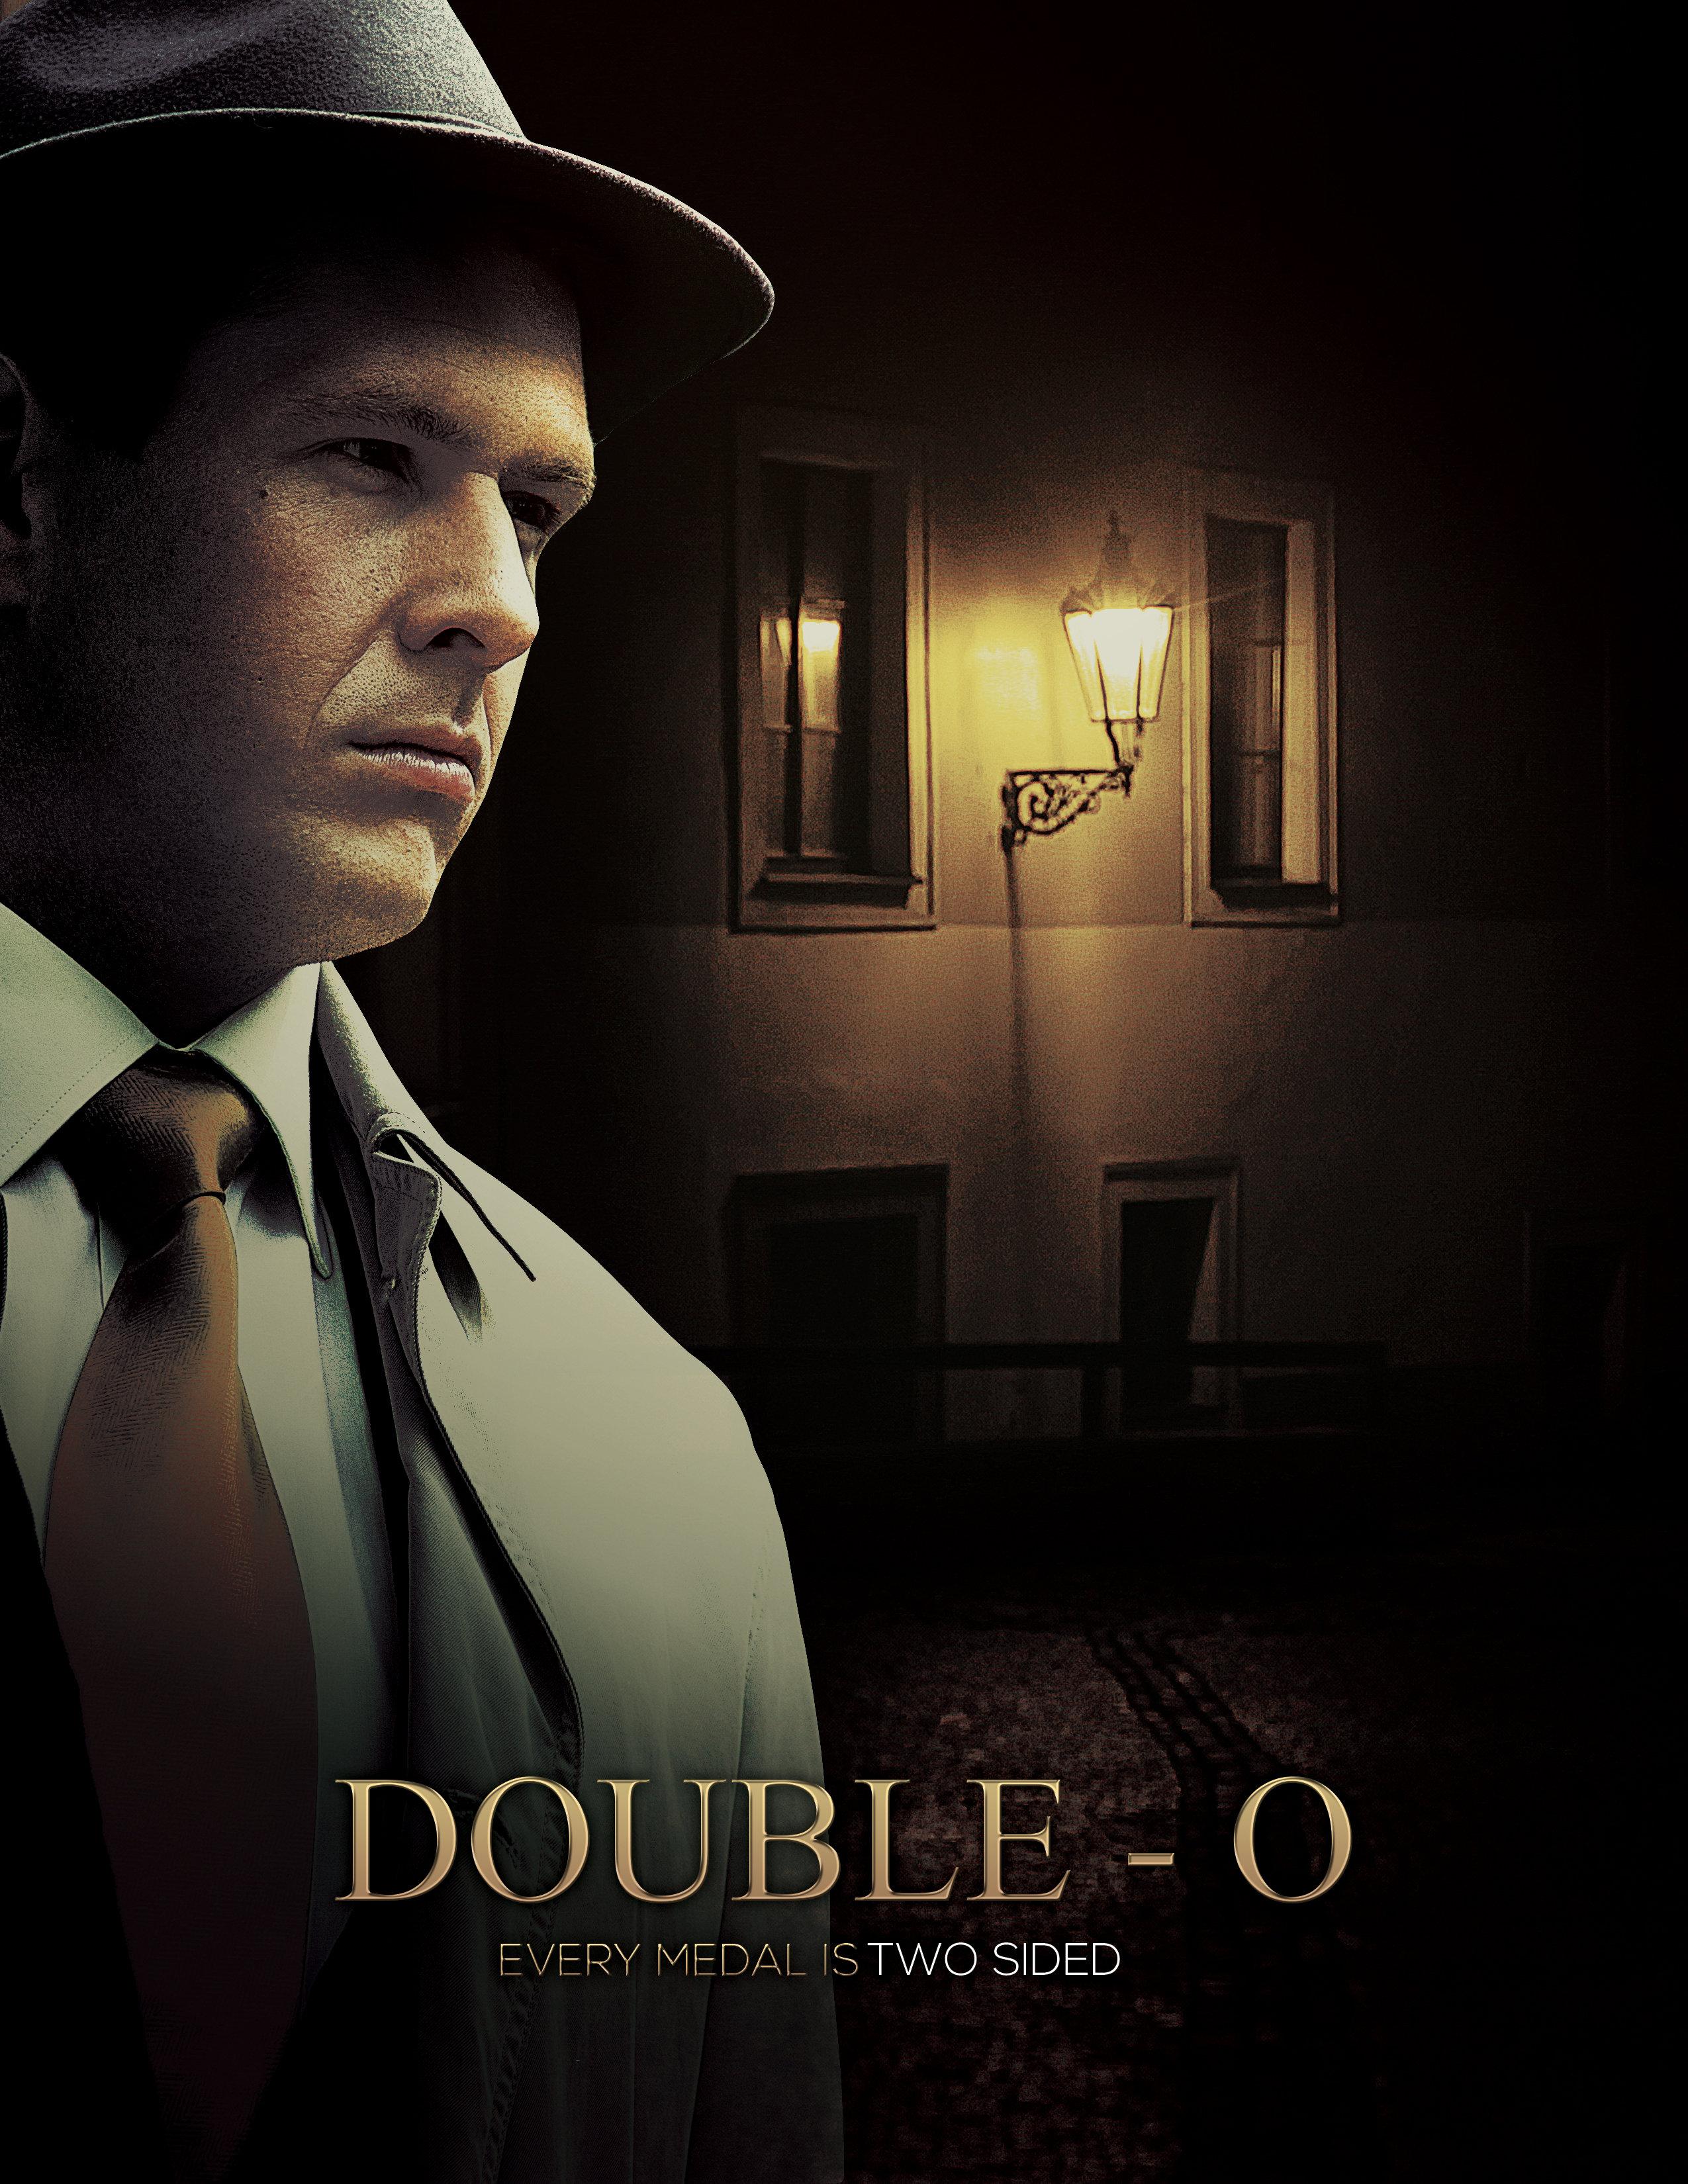 Double-O